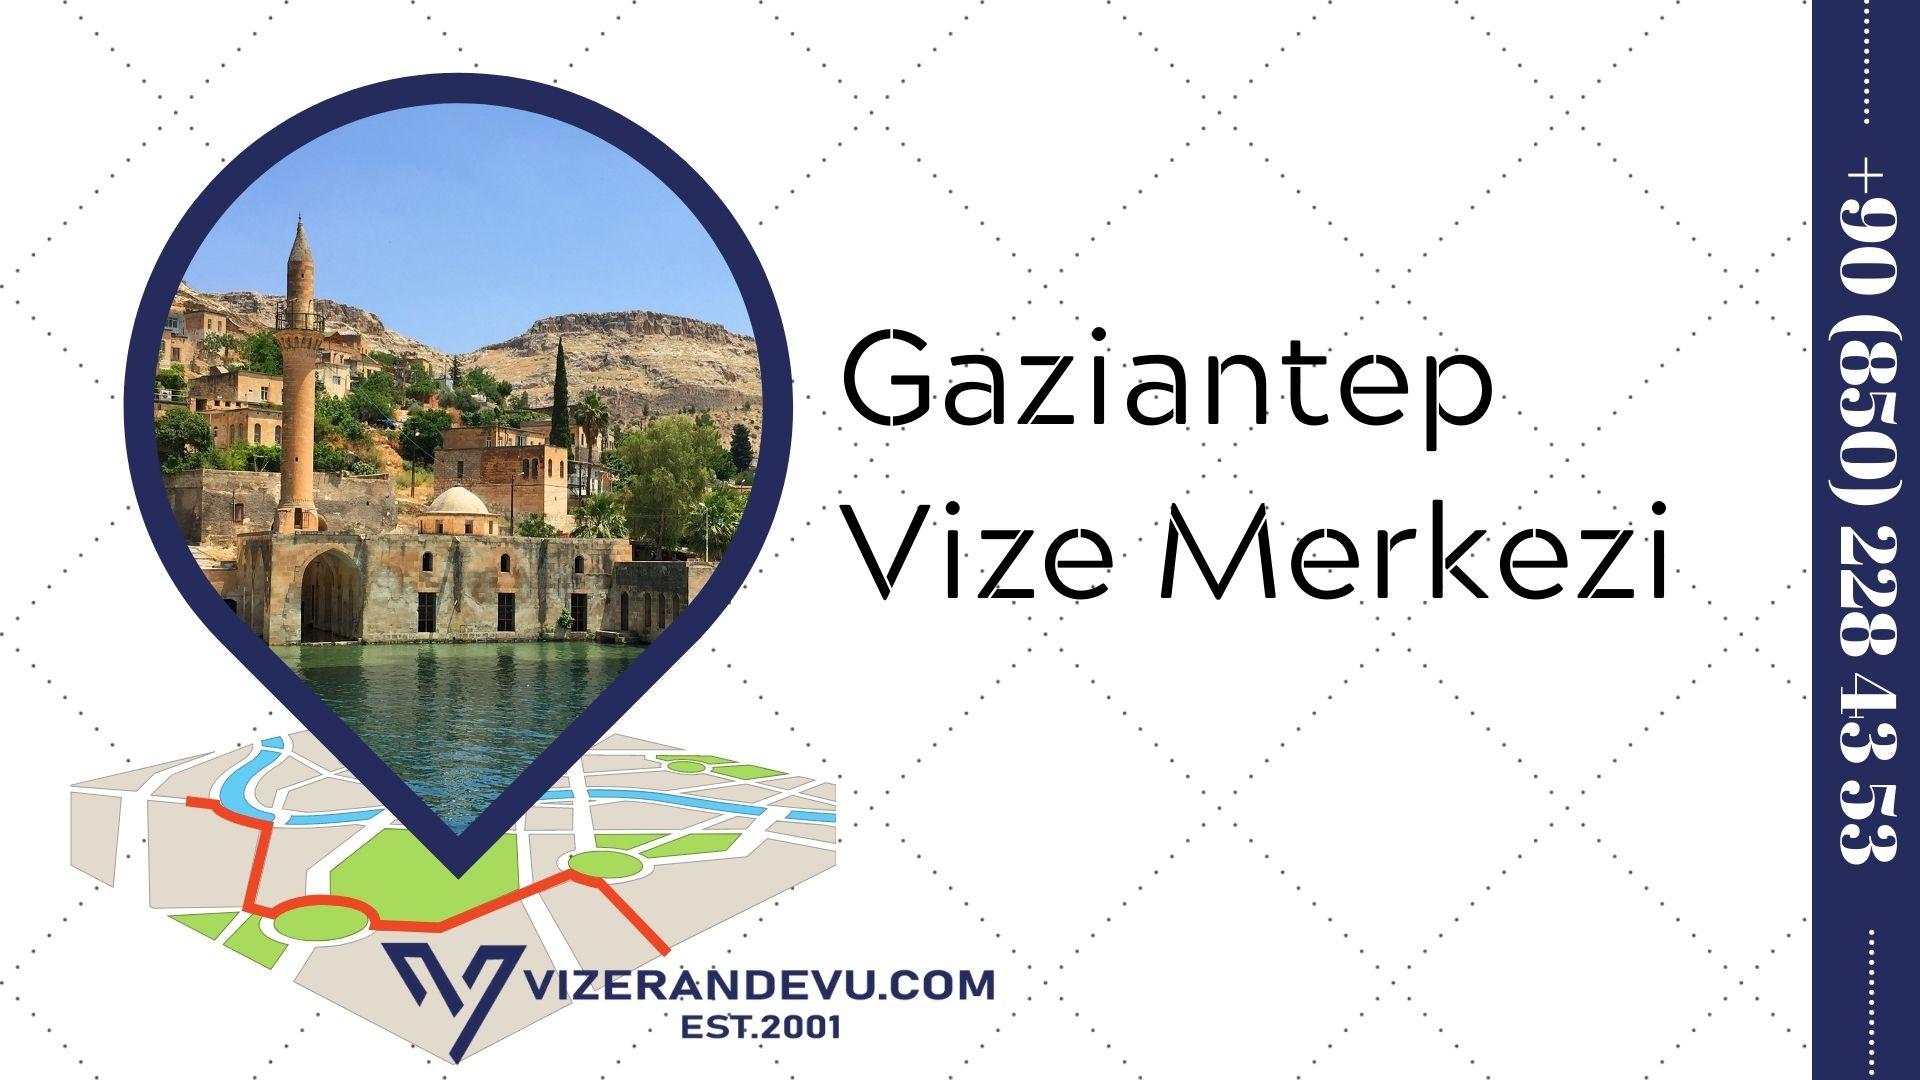 Gaziantep Vize Merkezi